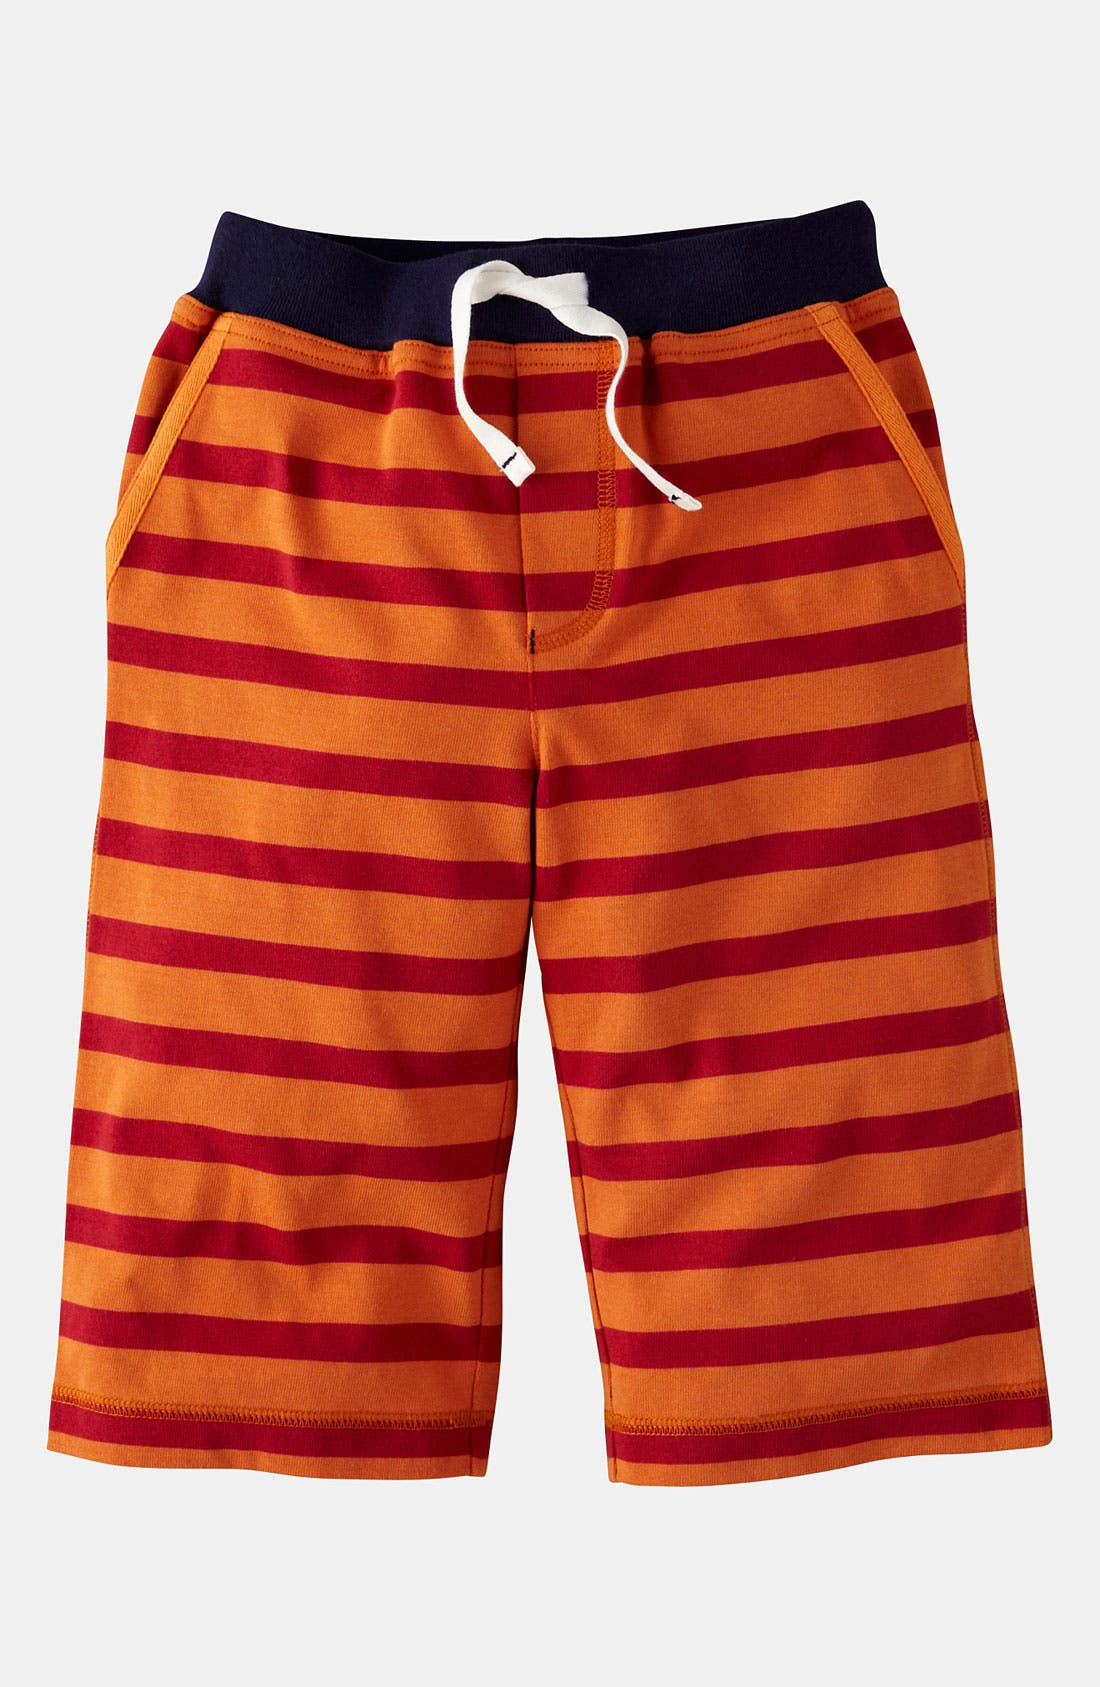 Main Image - Mini Boden Stripe Shorts (Toddler, Little Boys & Big Boys)